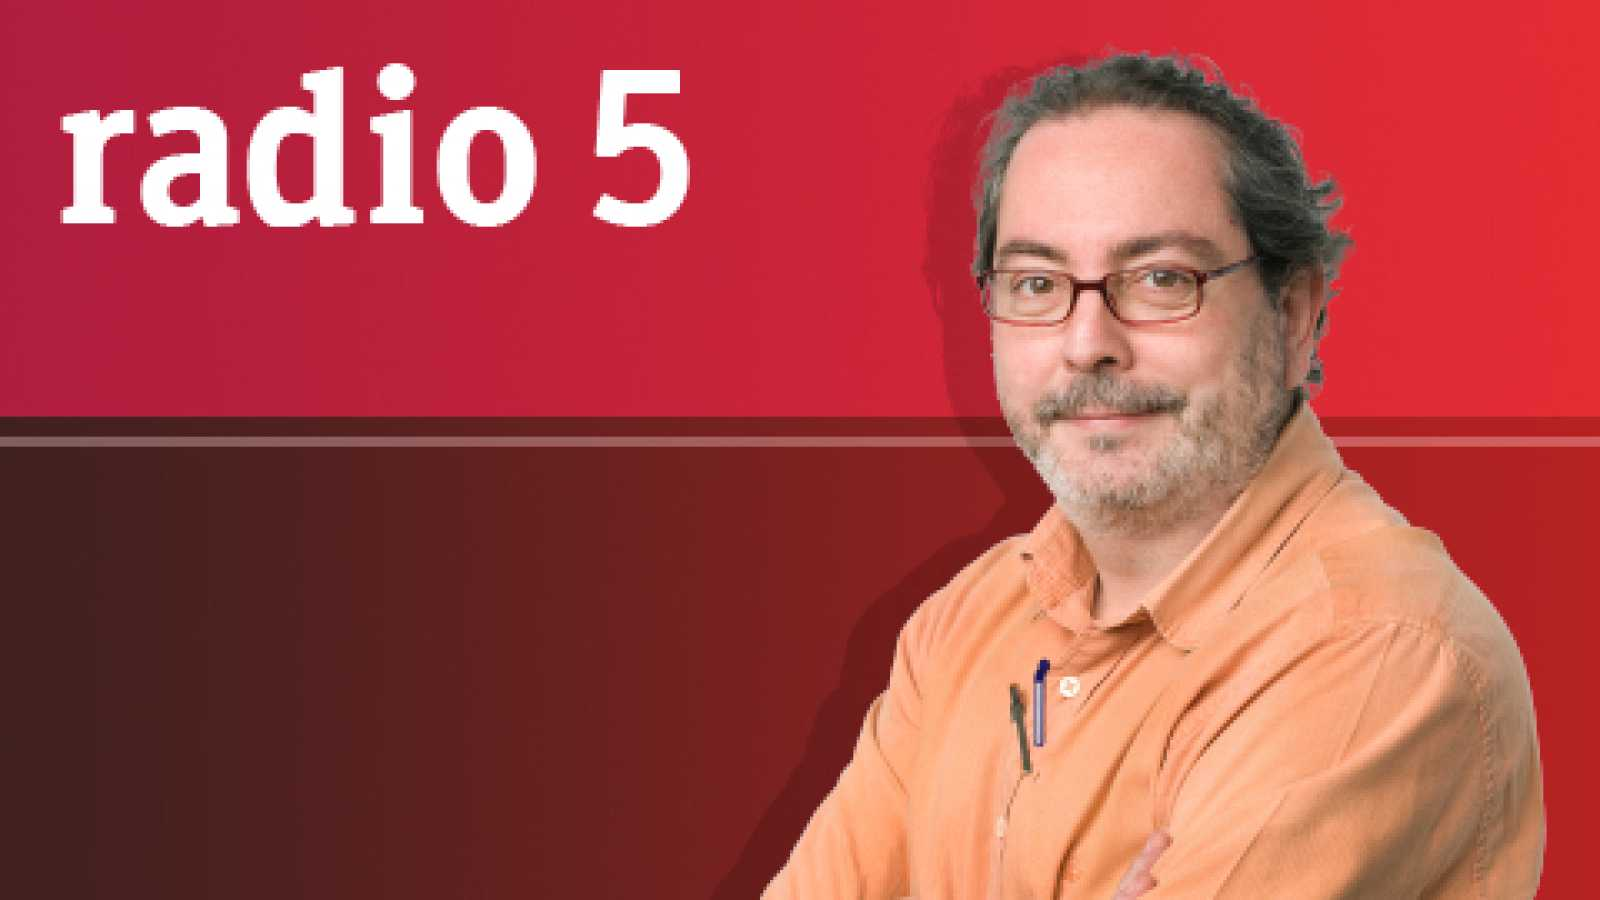 Ondas de ayer - La Academia actualiza términos radiofónicos - 13/09/16 - escuchar ahora